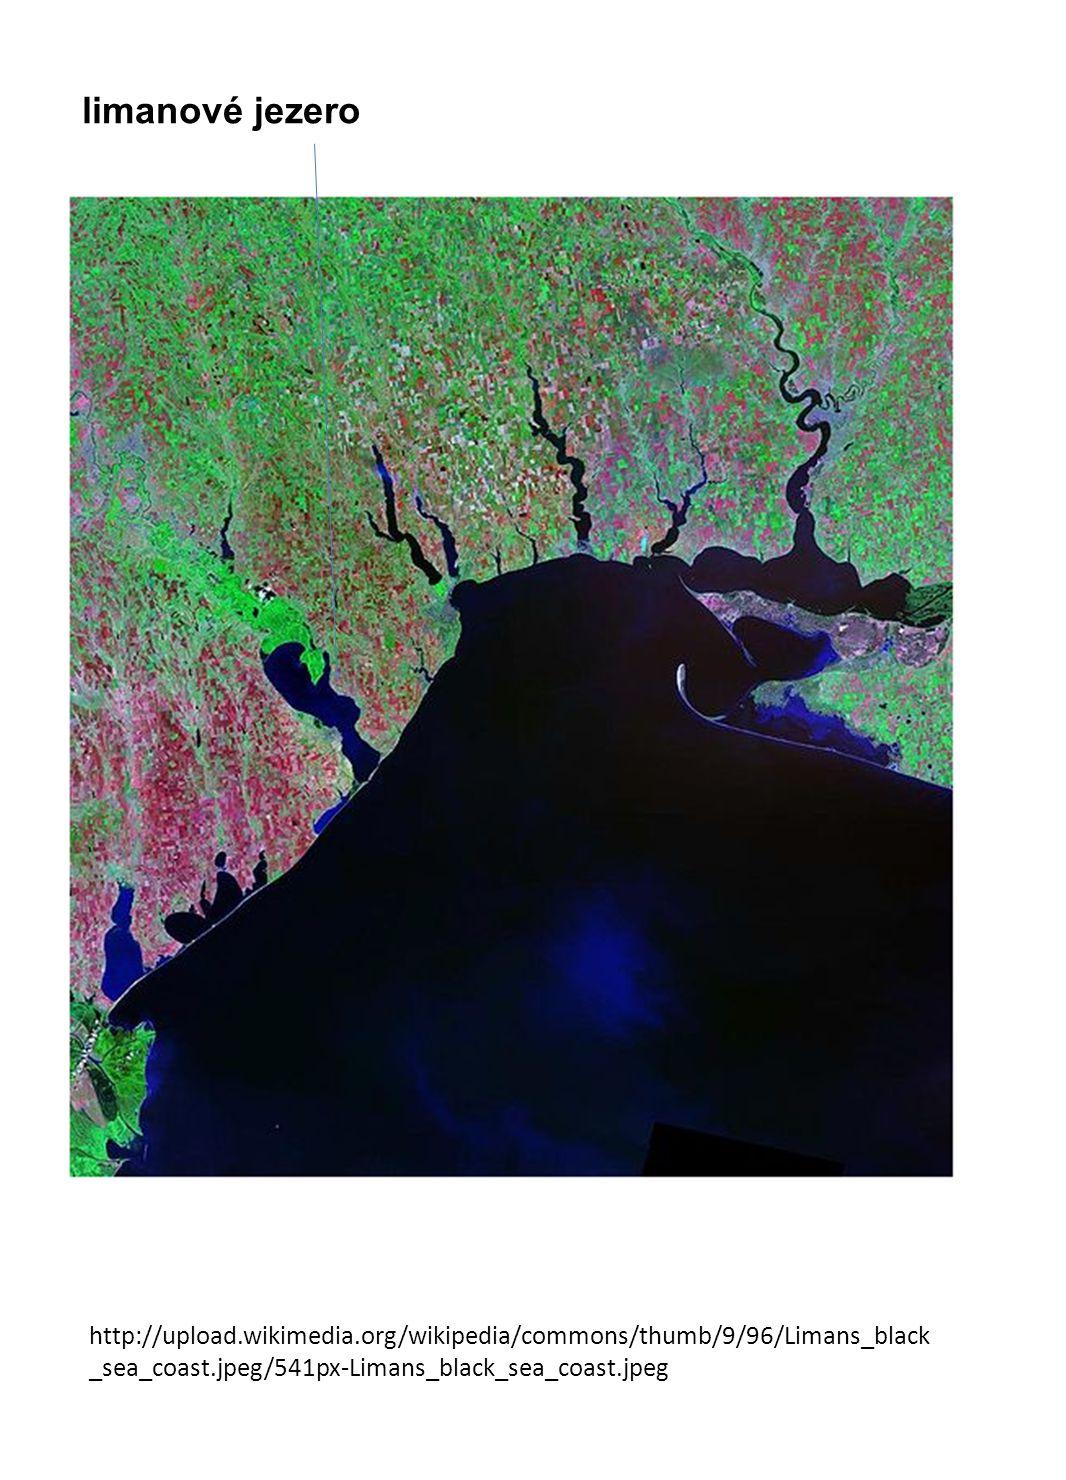 http://upload.wikimedia.org/wikipedia/commons/thumb/9/96/Limans_black _sea_coast.jpeg/541px-Limans_black_sea_coast.jpeg limanové jezero